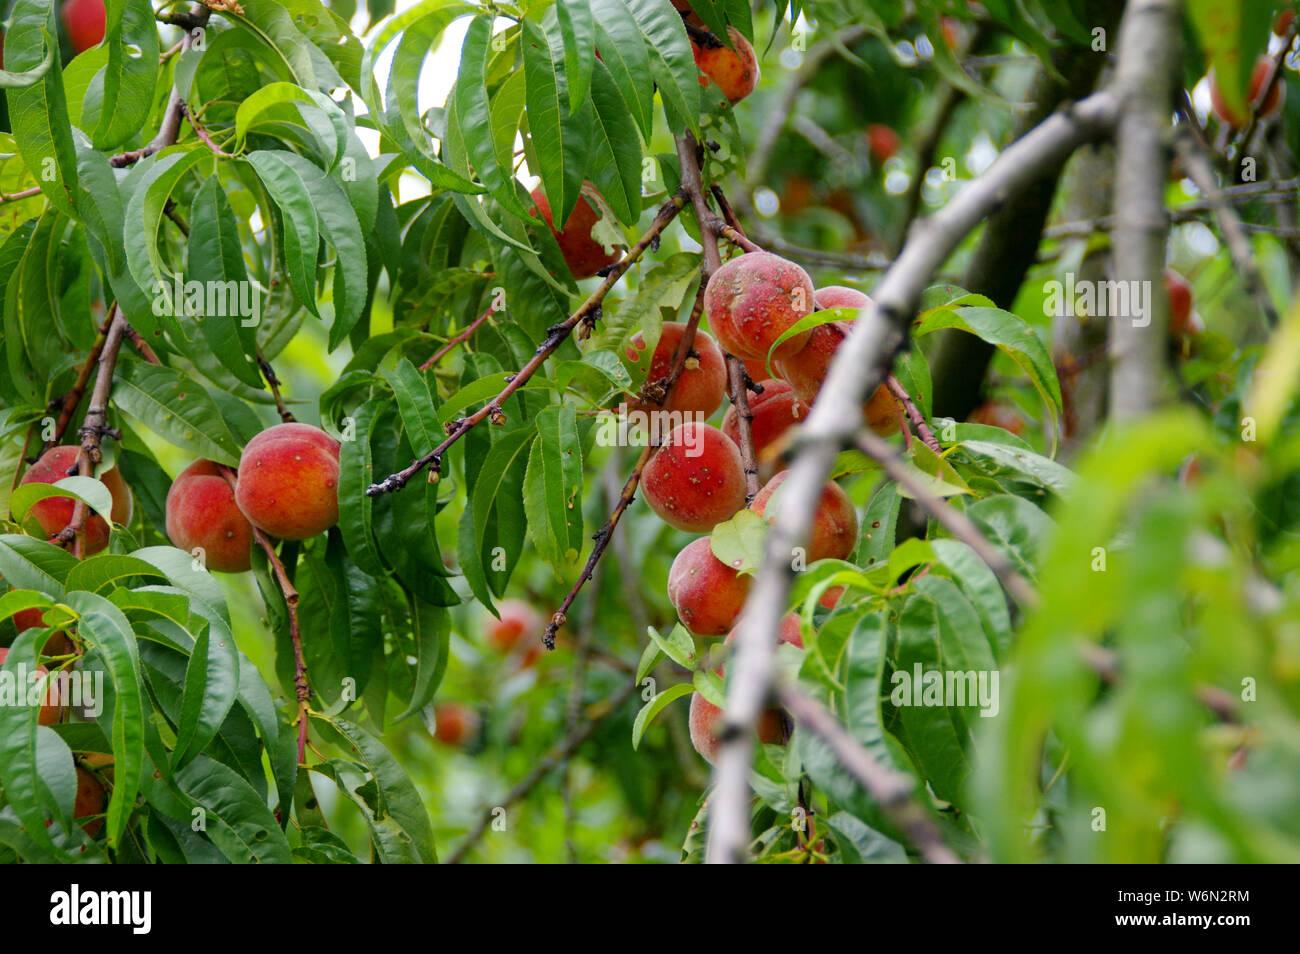 Peach tree in a home garden. Abundant fruit harvest on the branch. Stock Photo